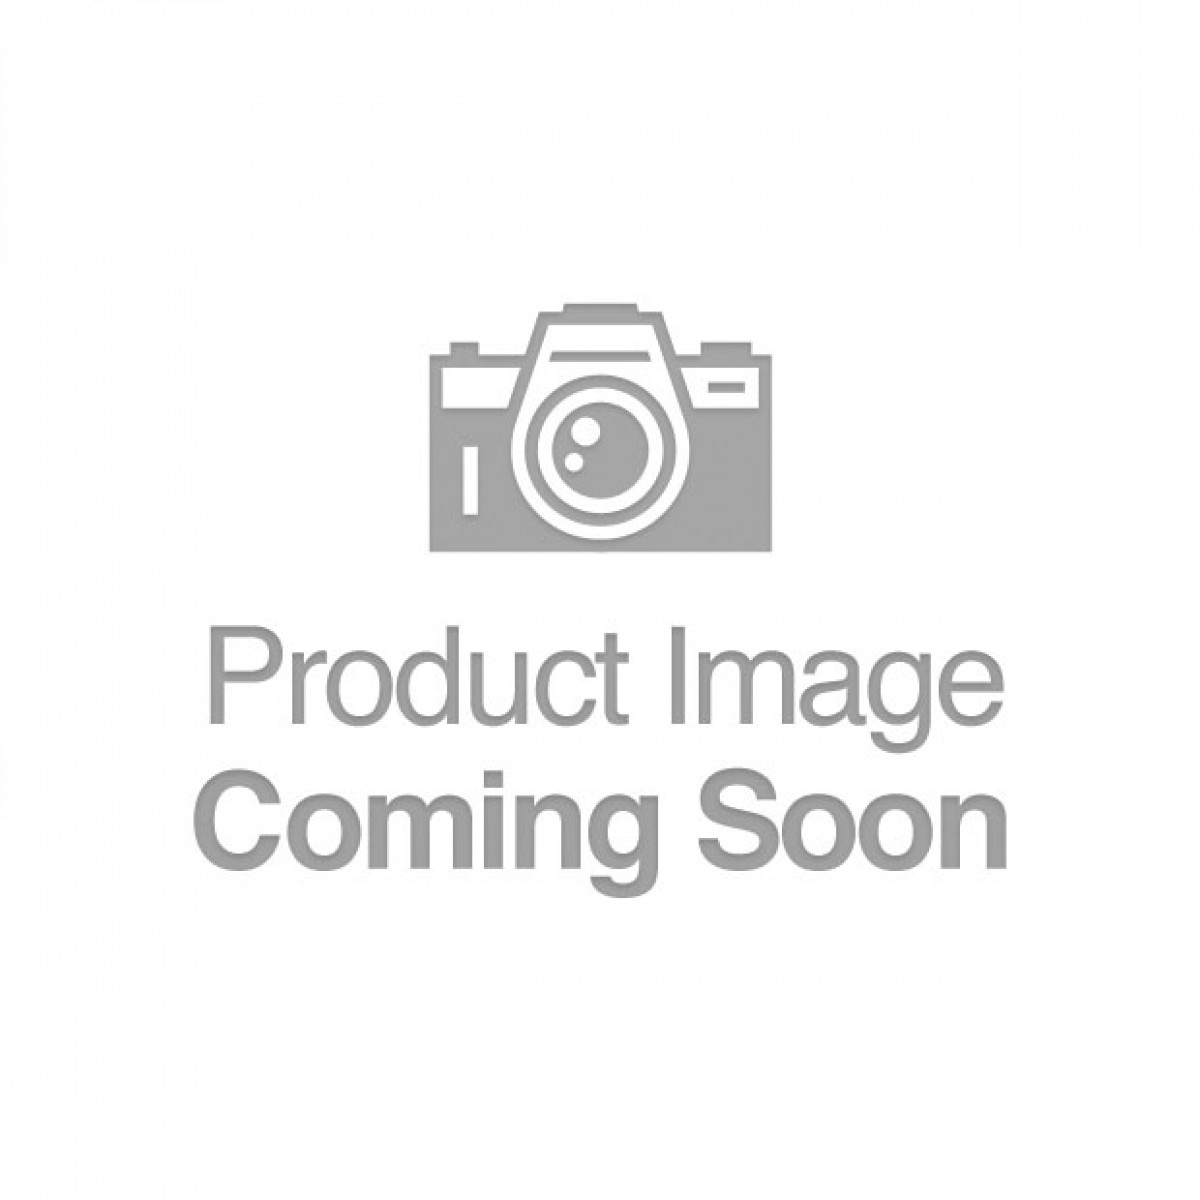 Nexus Fortis Aluminum Vibrating Prostate Massager